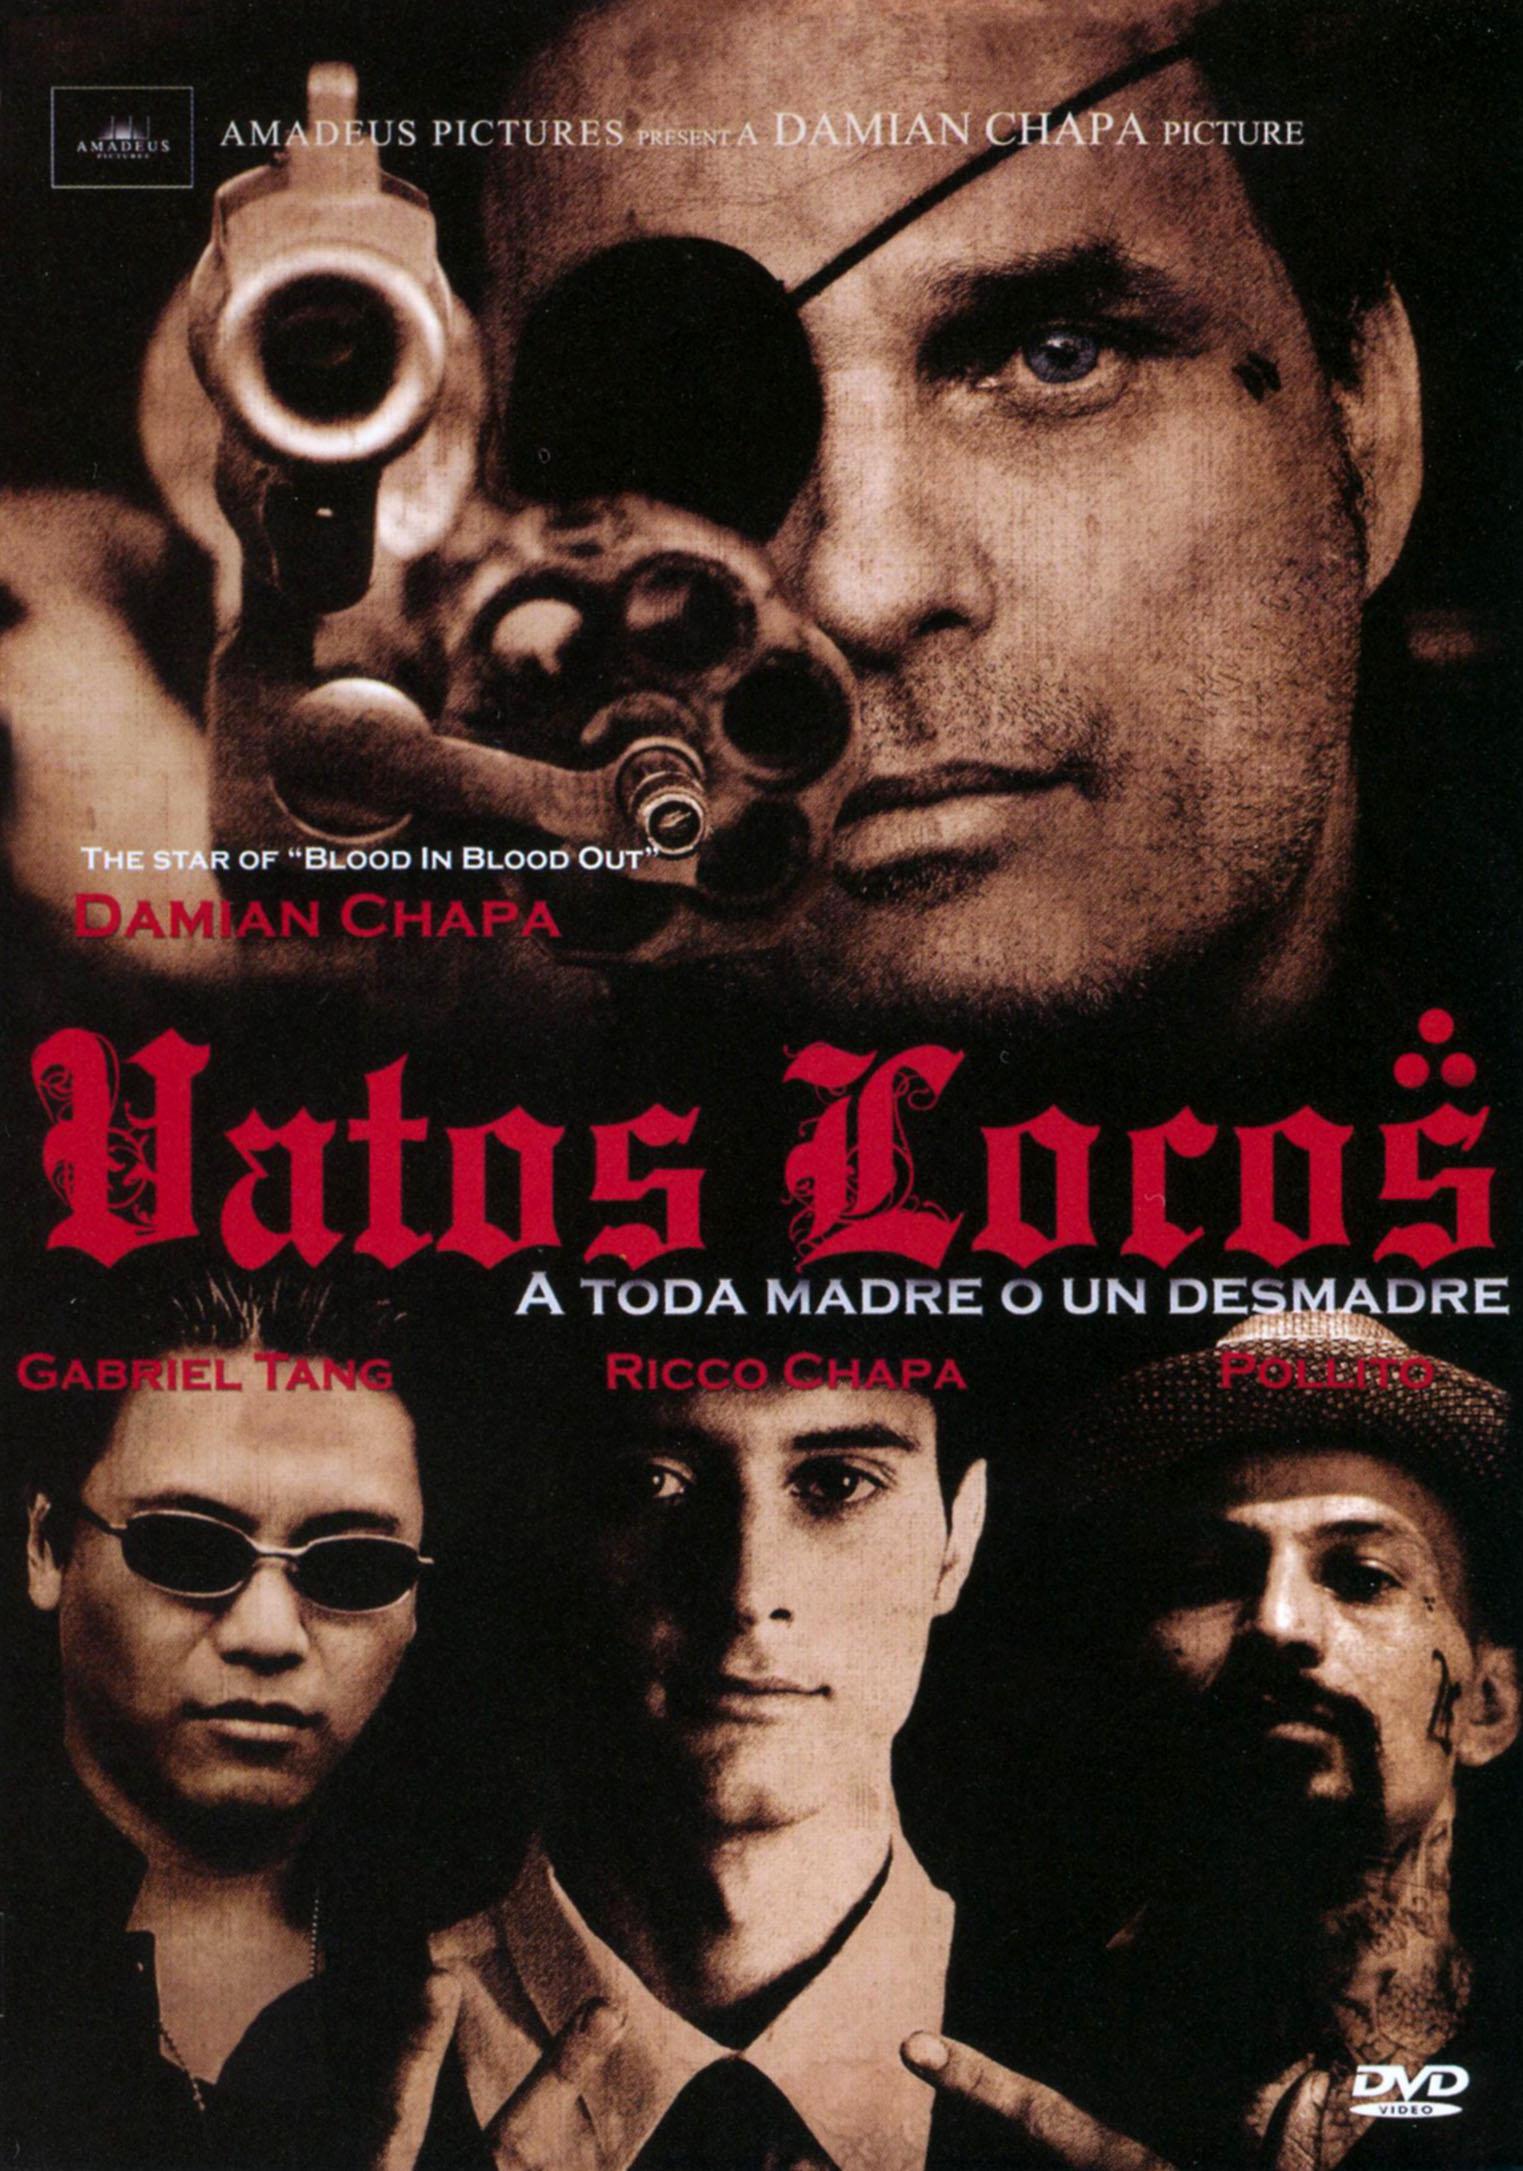 Vatos Locos (2011) - Damian Chapa | Cast and Crew | AllMovie